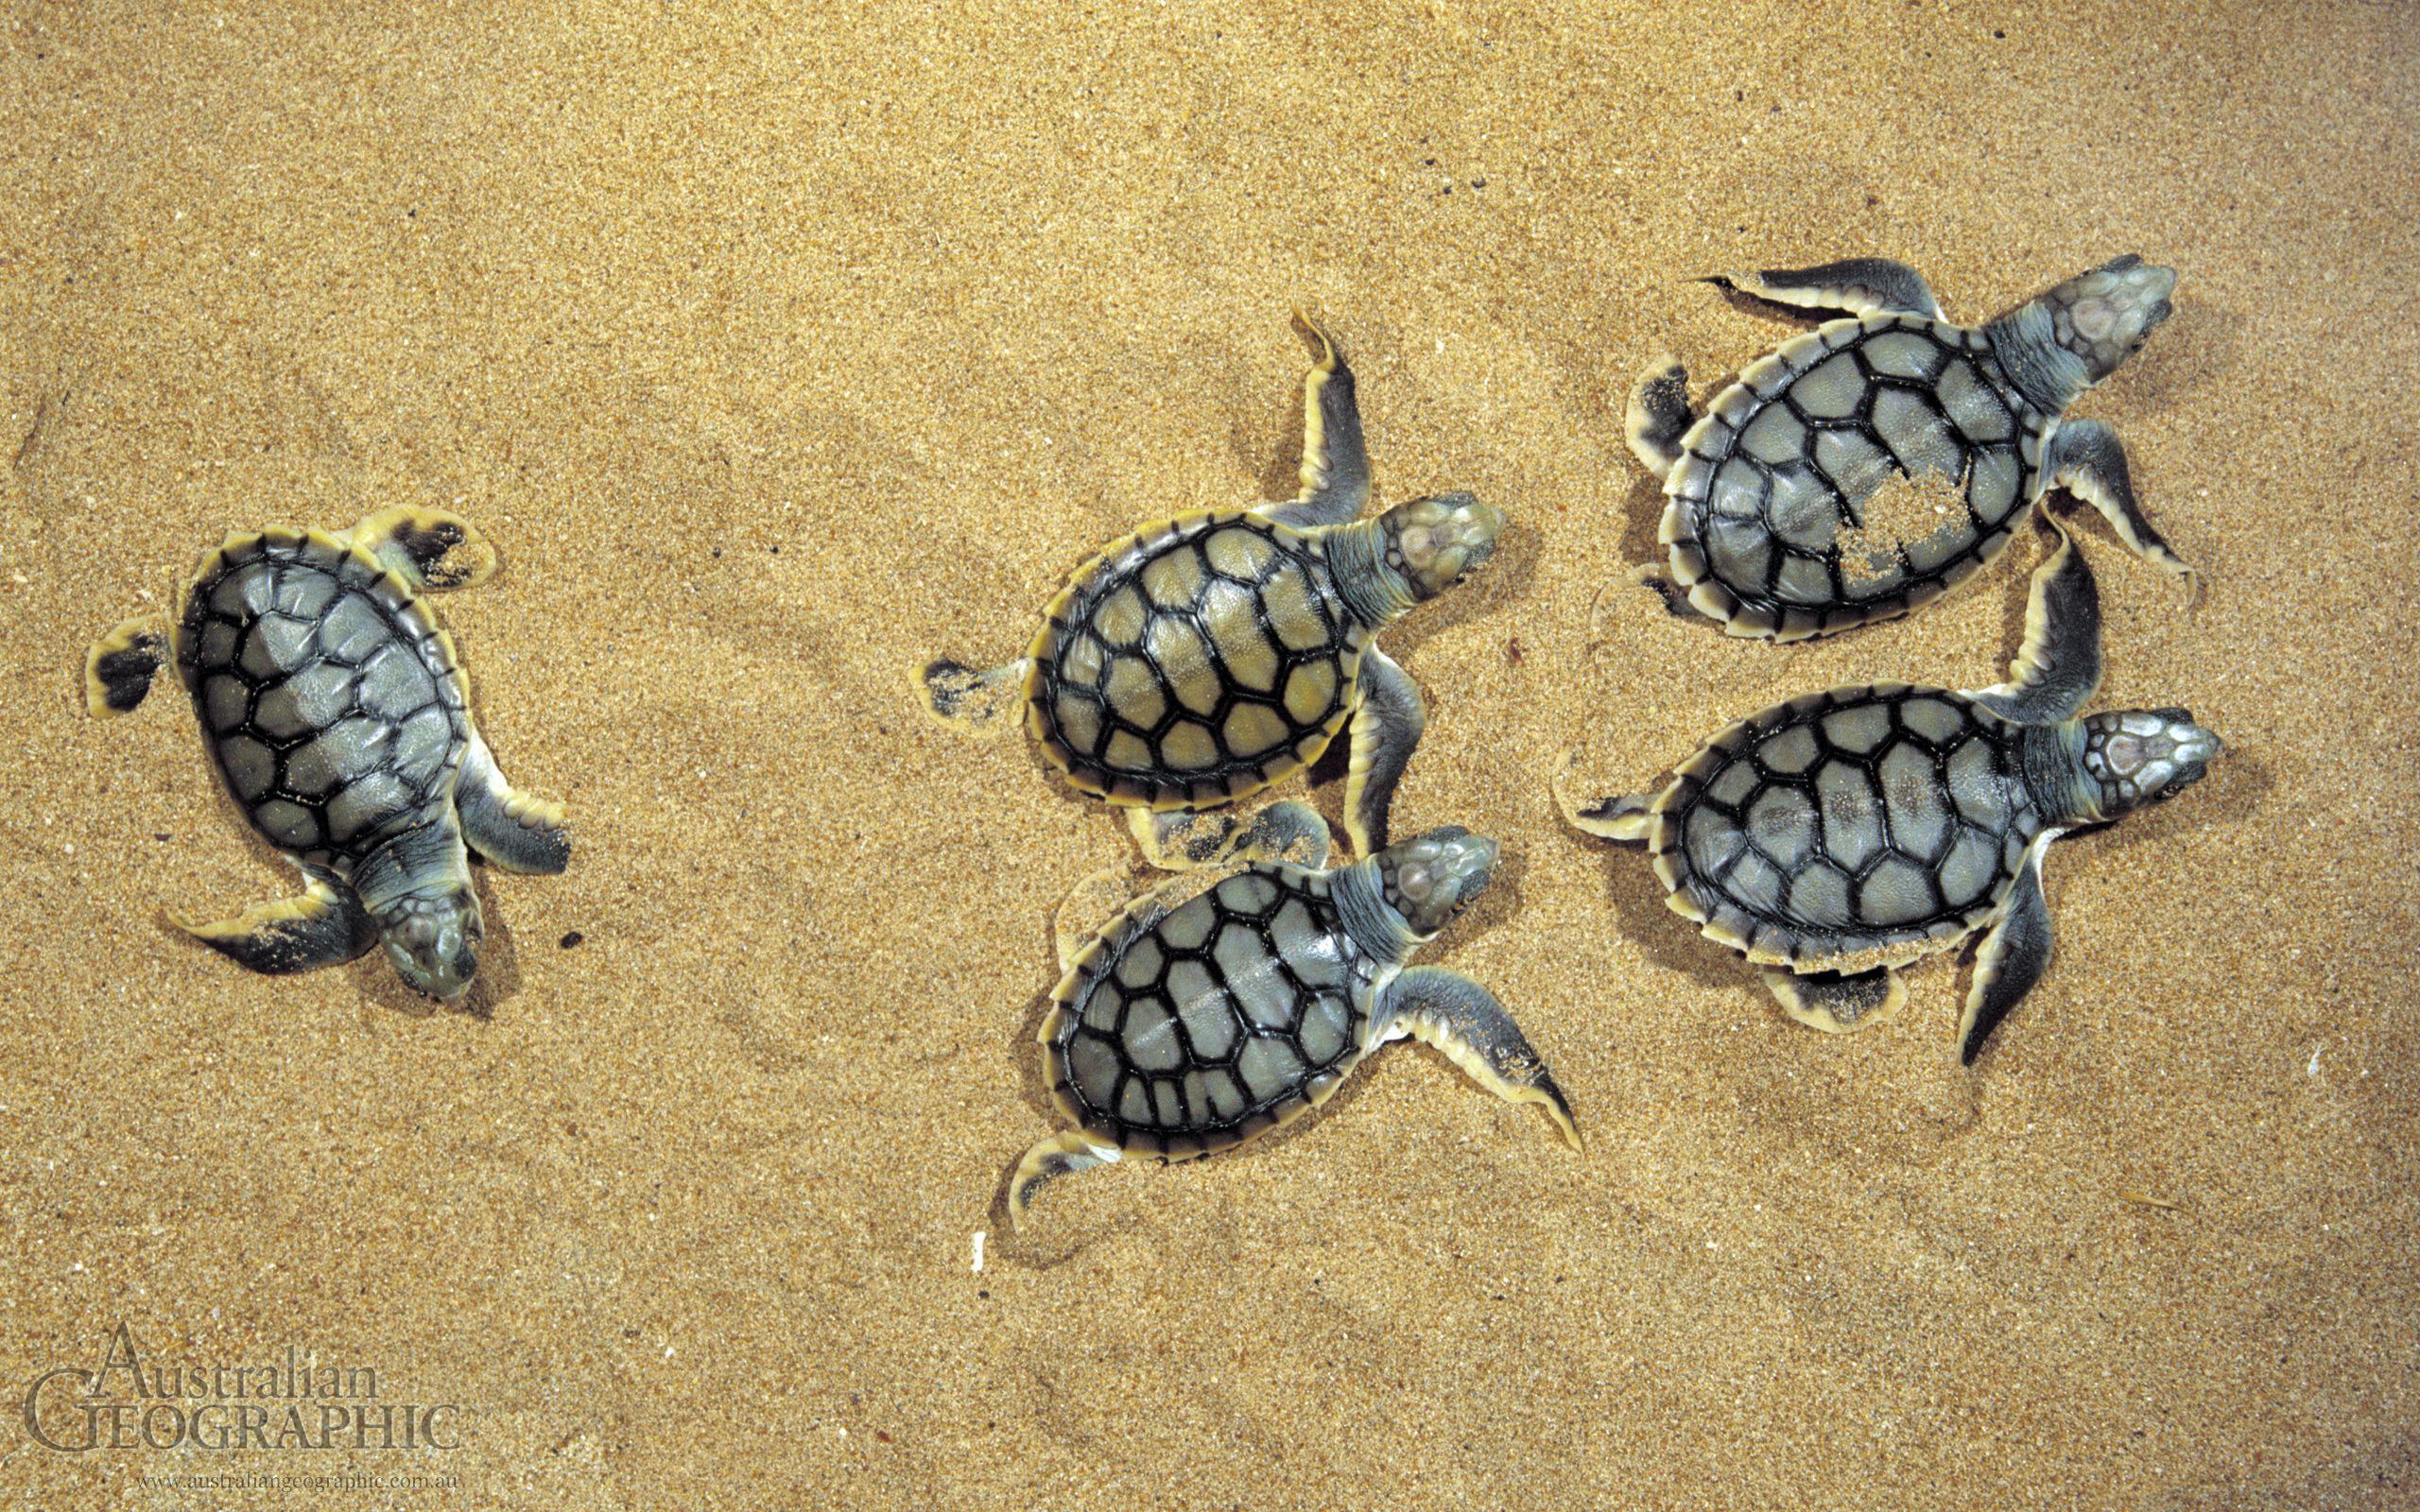 Turtle flatback turtle hatchlings bare sand island nt download turtle flatback turtle hatchlings bare sand island nt download the publicscrutiny Gallery